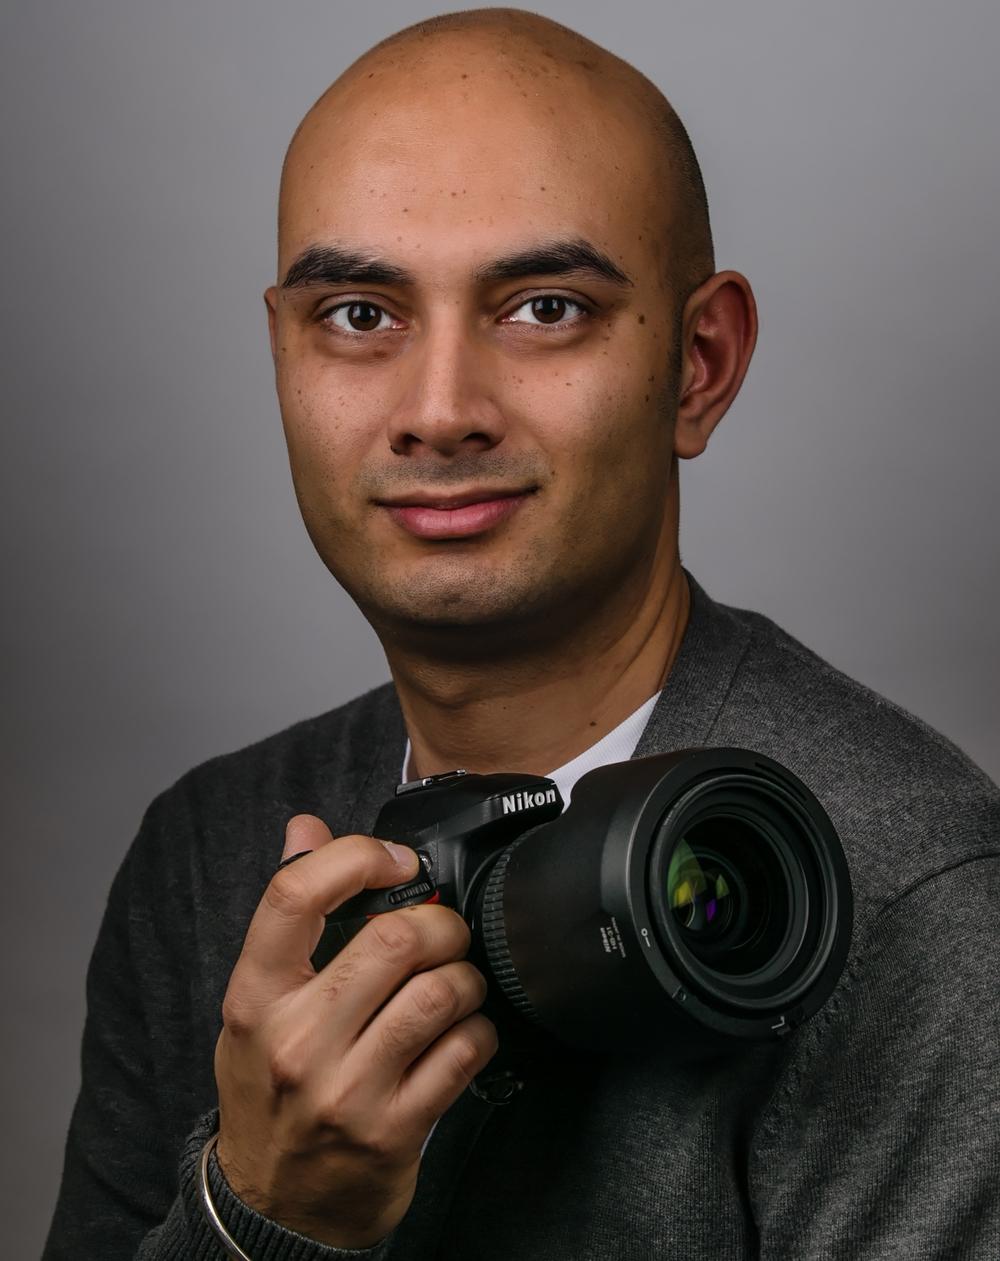 London Portraits-5855-2.JPG